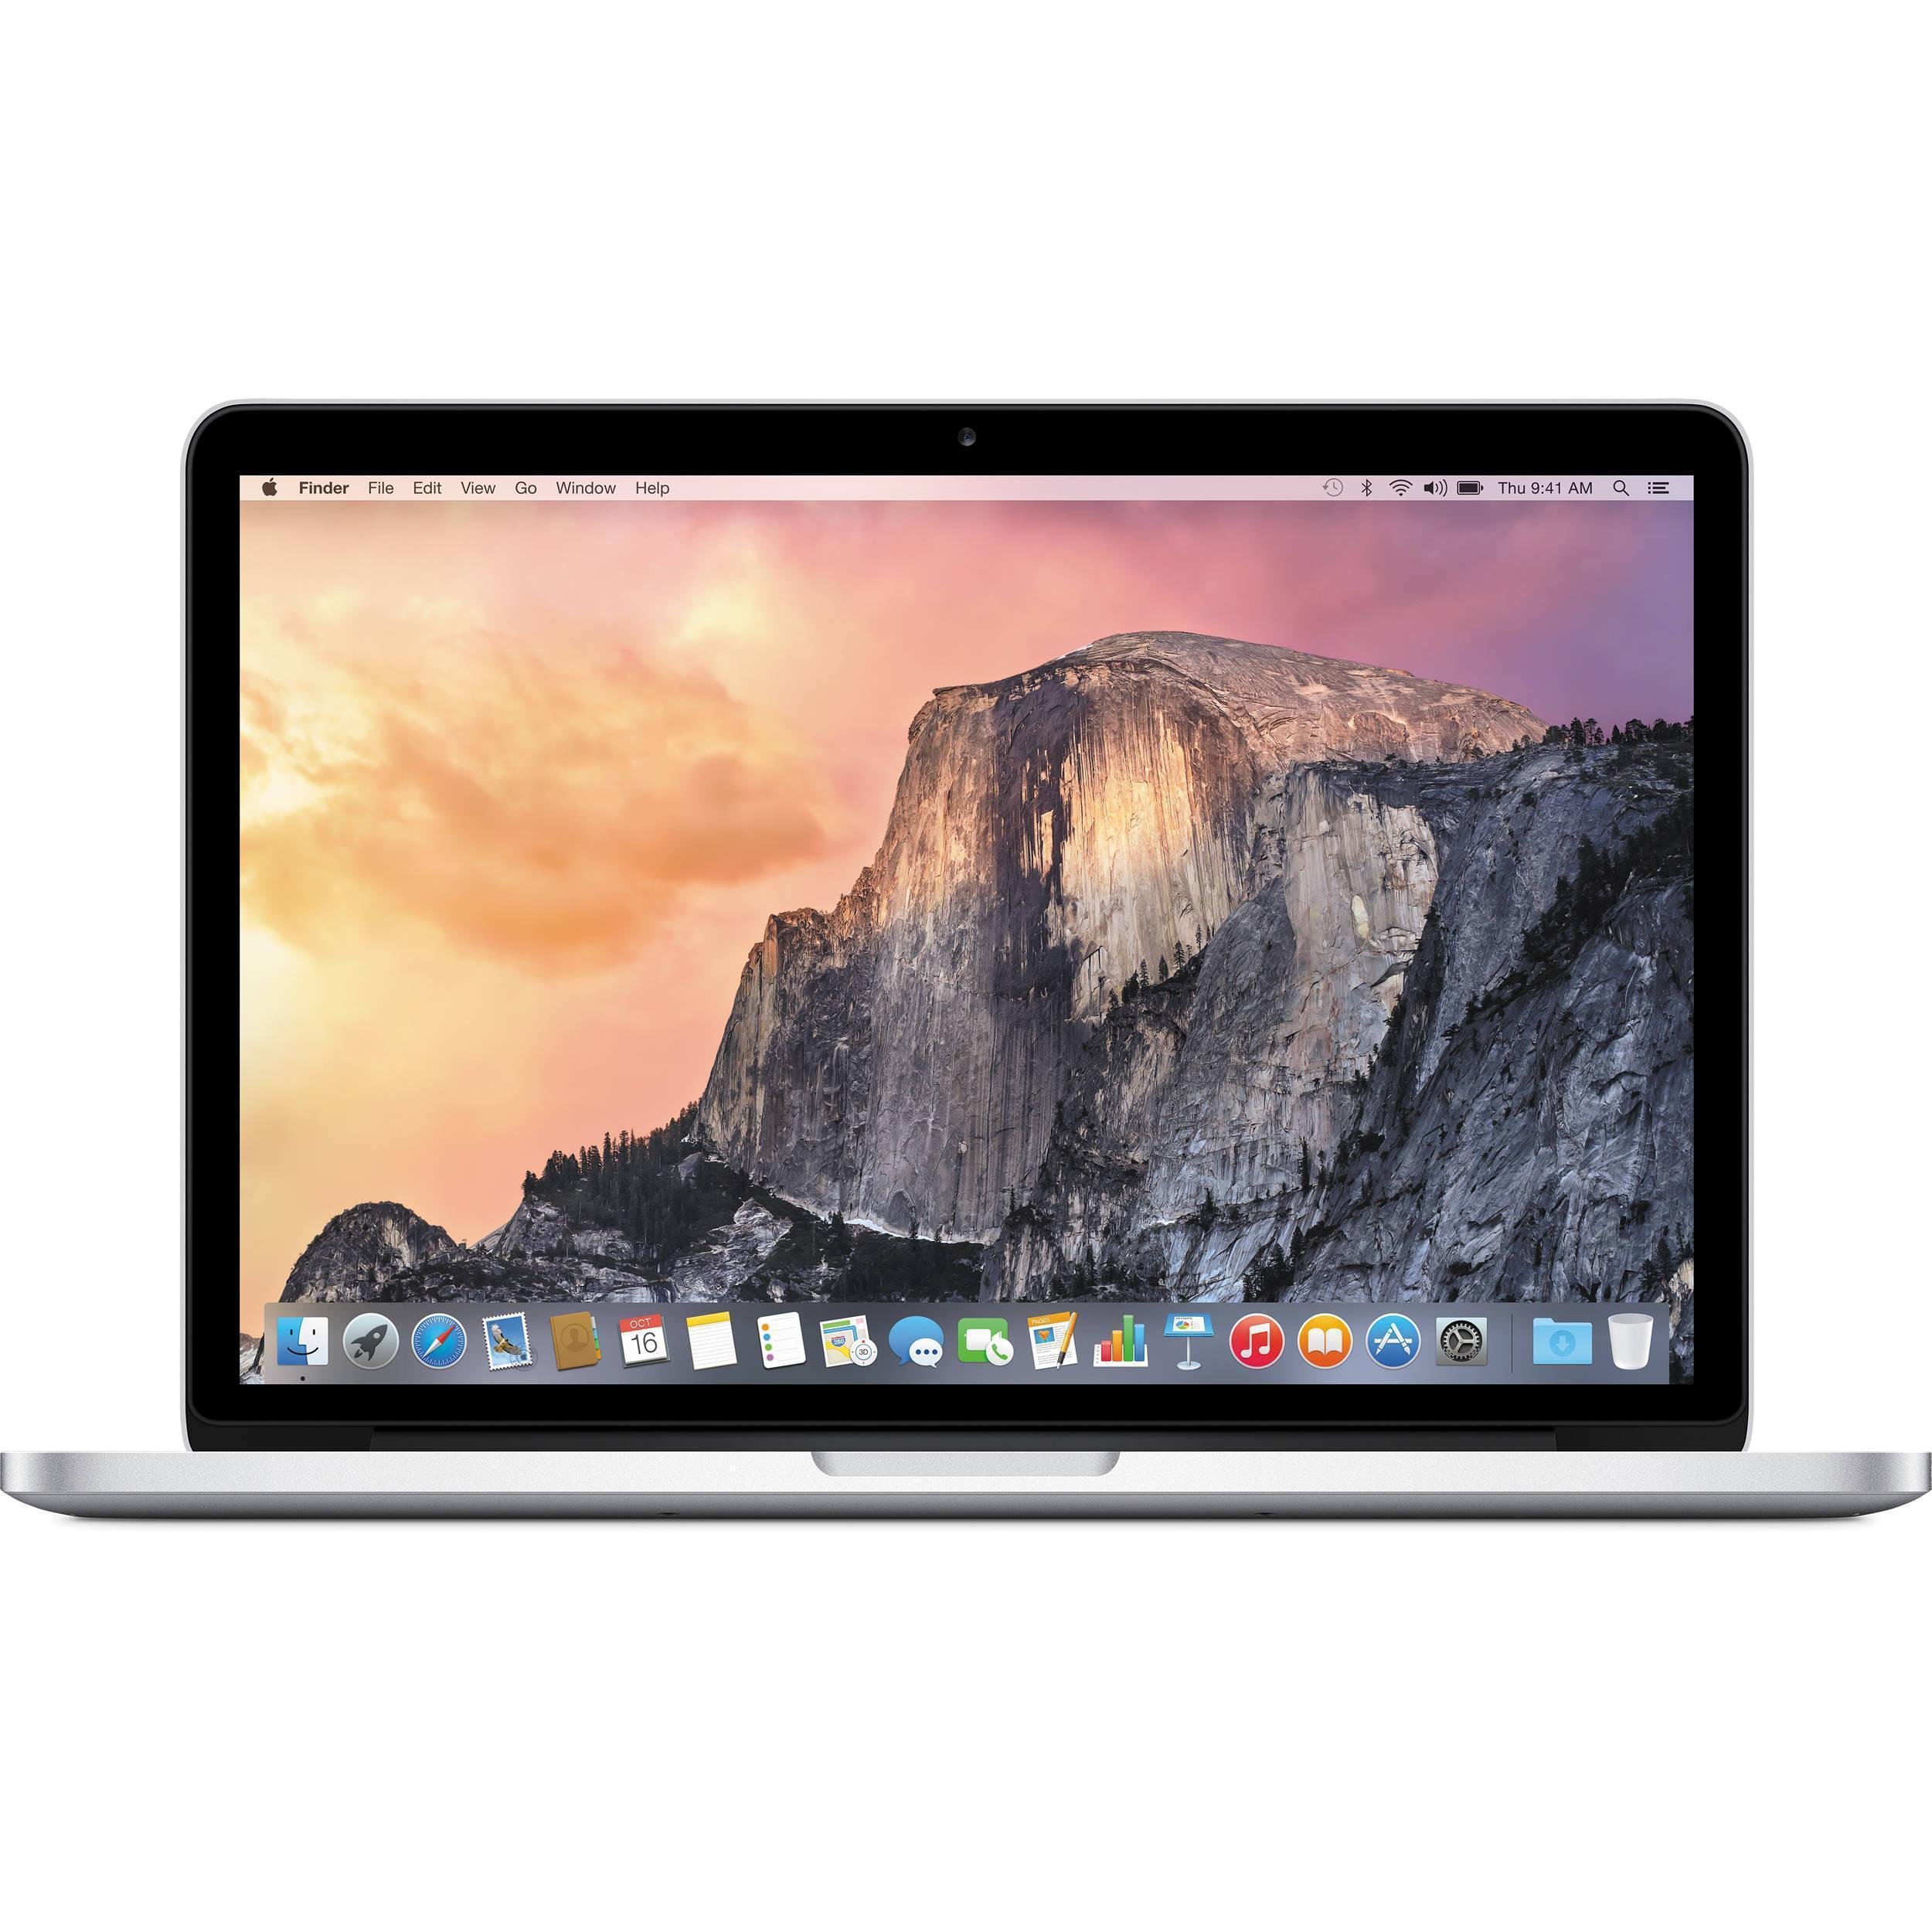 MacBook Pro Retina 13.3-inch (2015) - Core i5 - 8GB - SSD 1000 GB